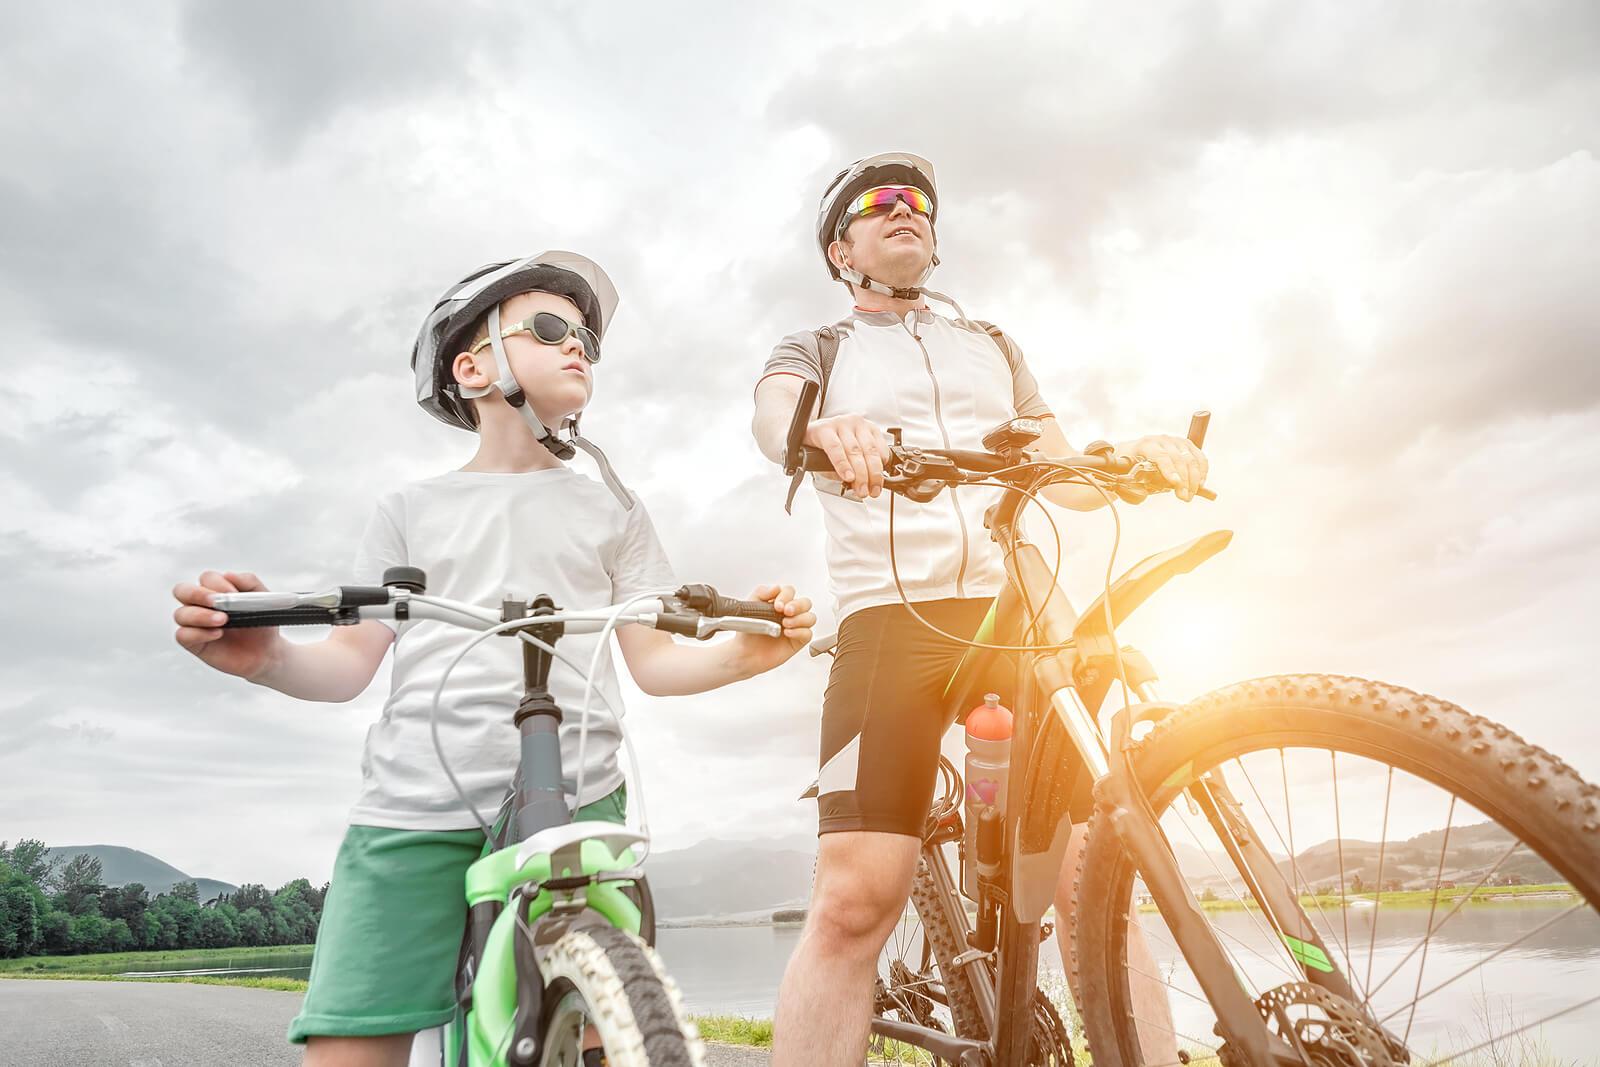 Padre e hijo haciendo una ruta en bicileta.